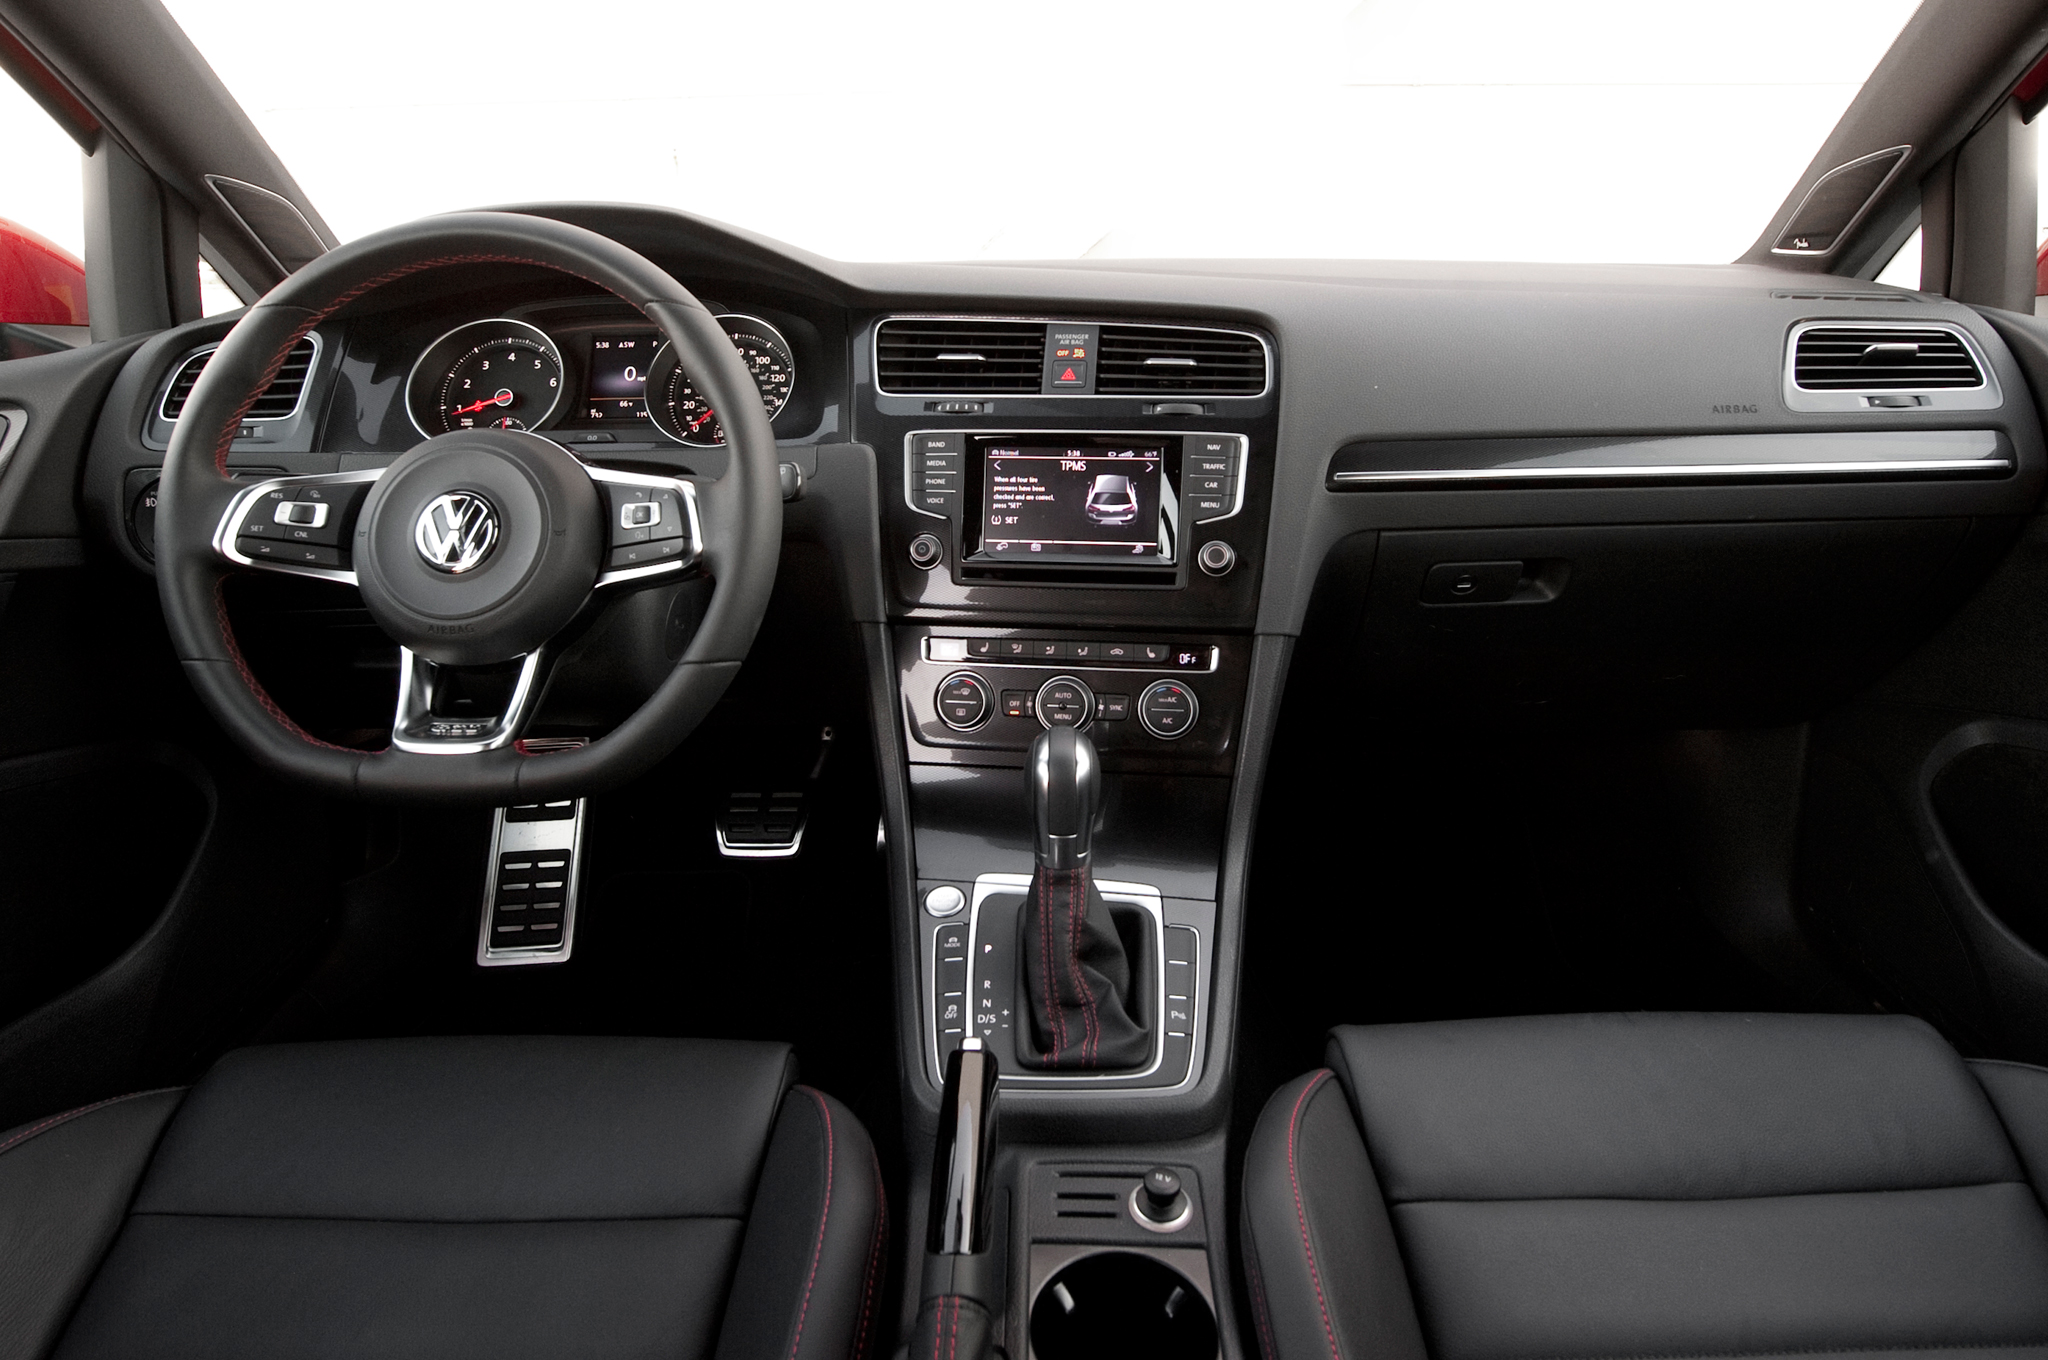 2015-Volkswagen Golf GTI Interior Dash and Panel